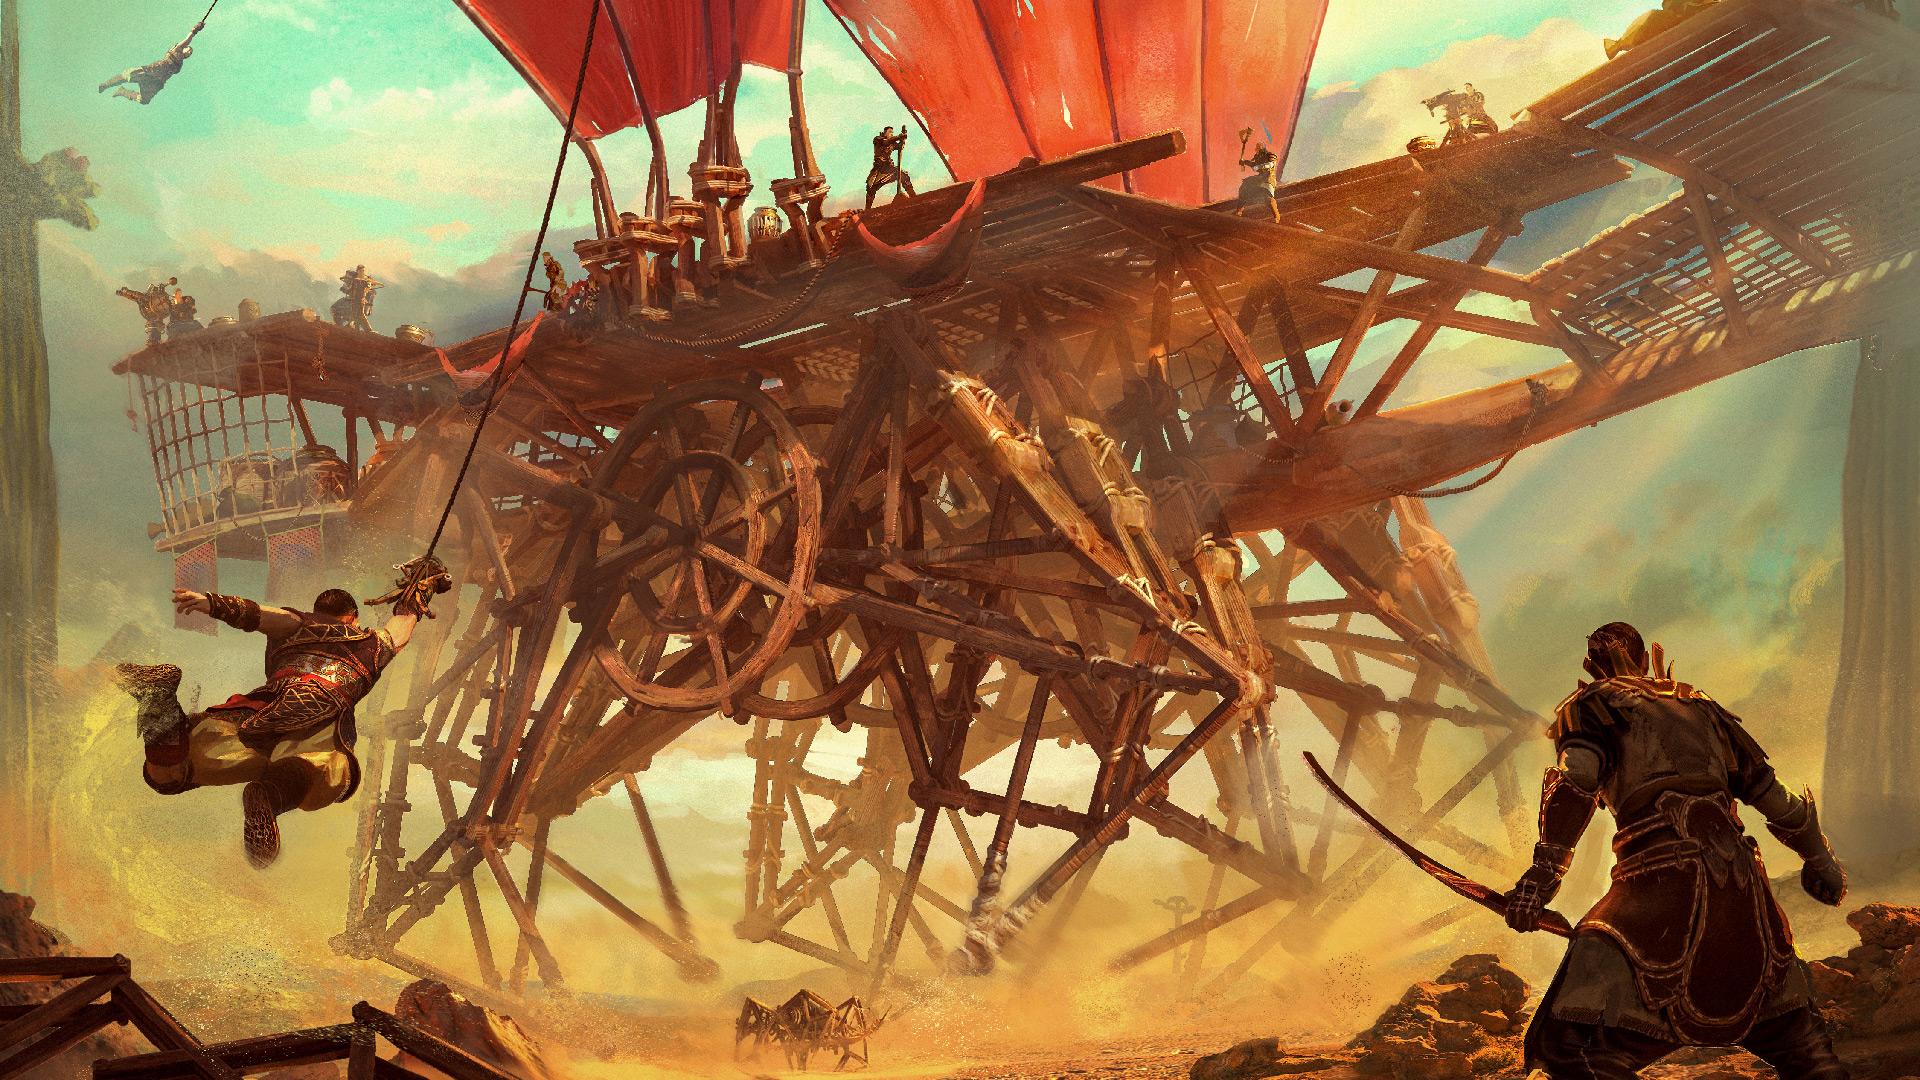 Nomadic survival game Last Oasis revolves around wooden mechs screenshot